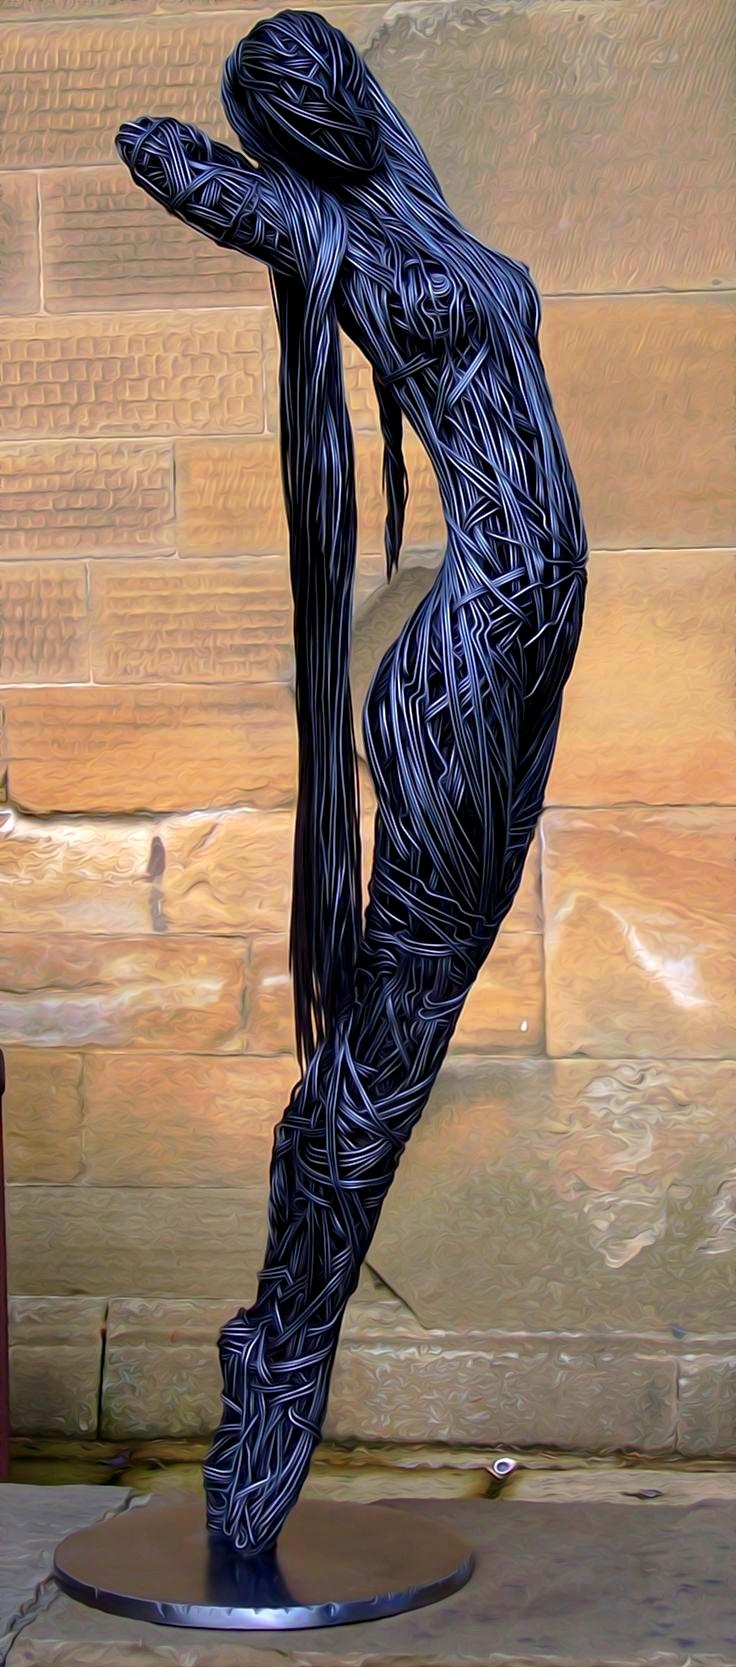 sculture-filo-metallico-Richard-Stainthorp-02